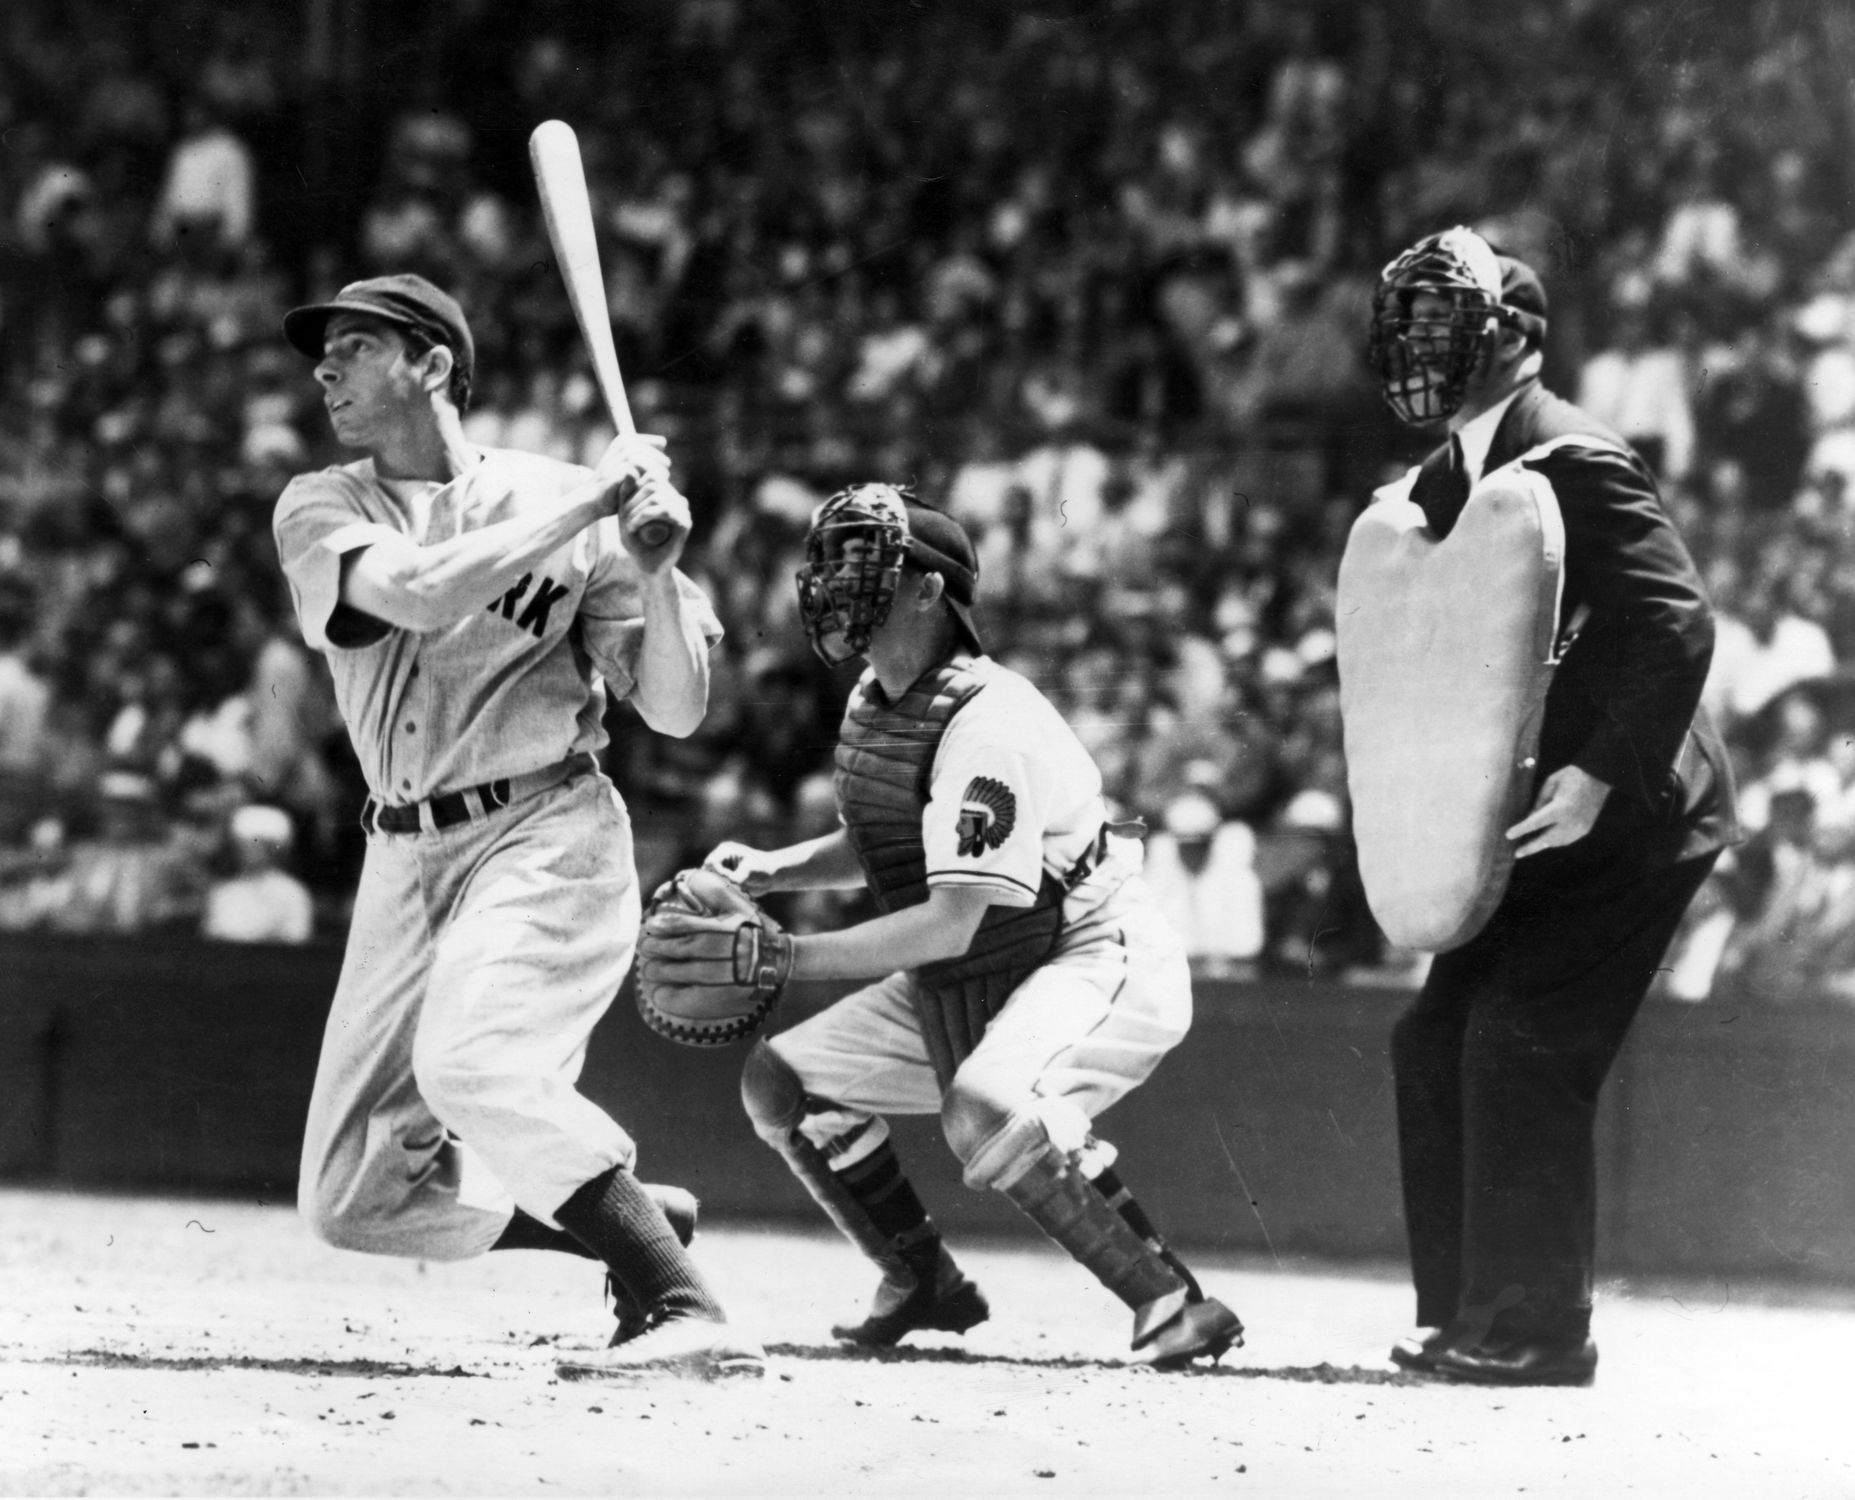 DiMaggio singles to start hitting streak | Baseball Hall ...